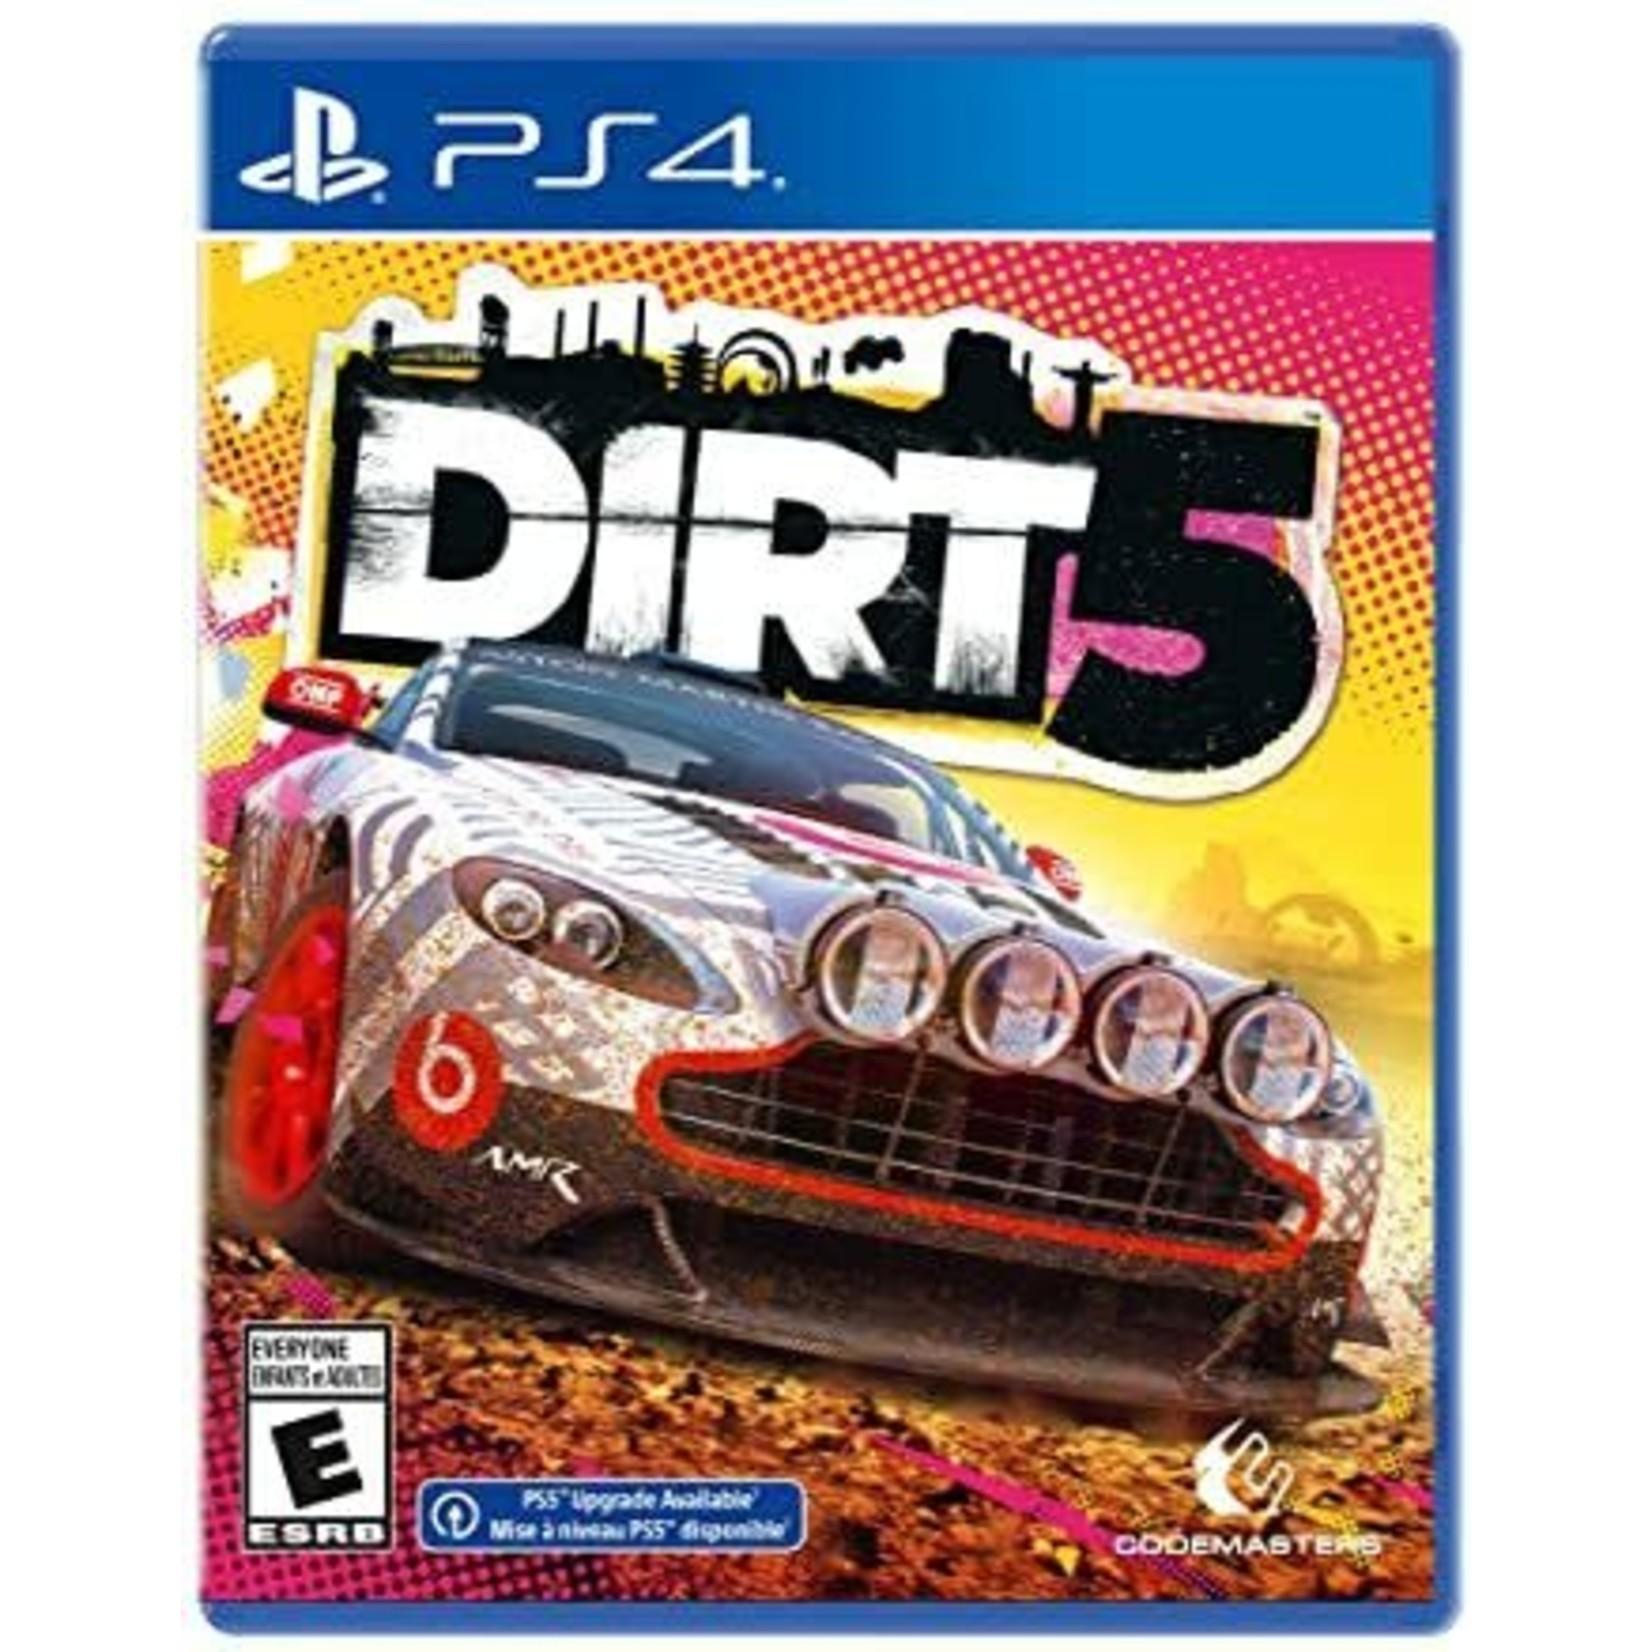 PS4-Dirt 5